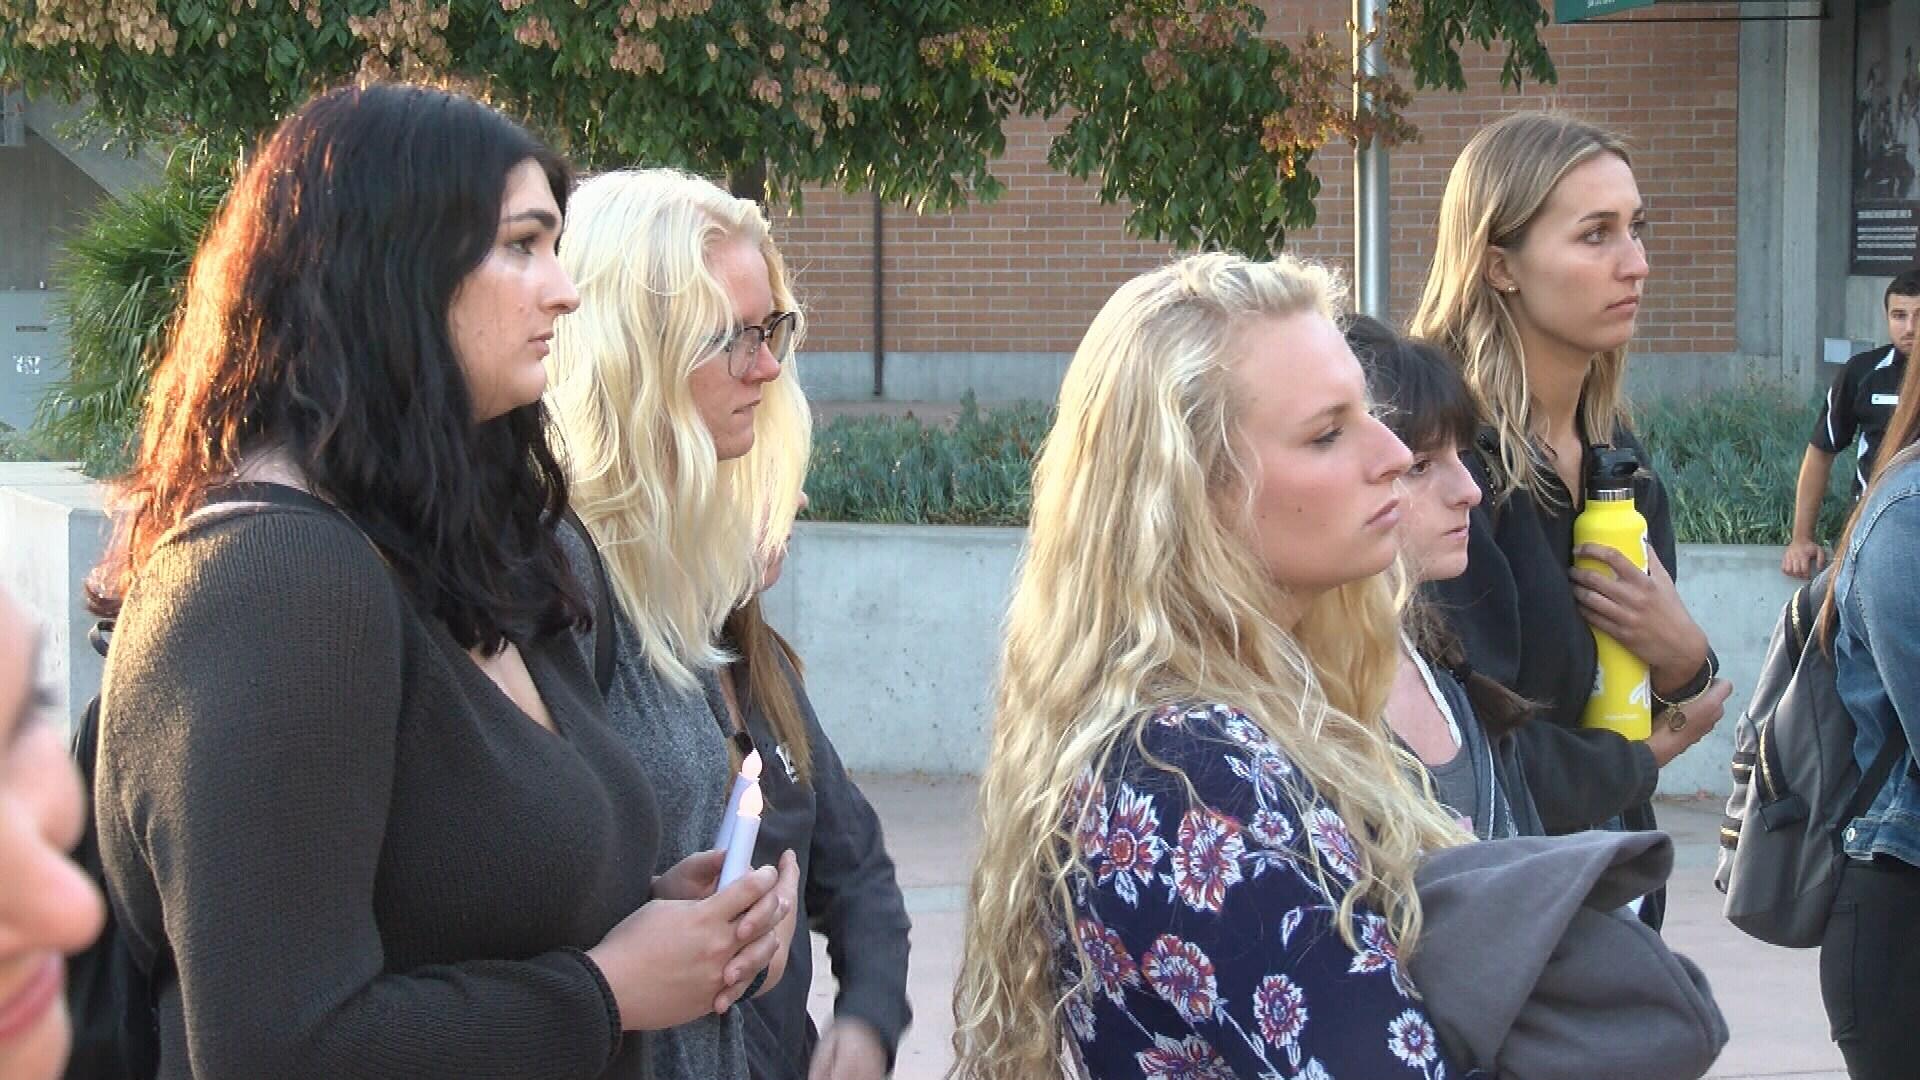 Vigil held at Cal Poly campus for Las Vegas shooting victims (KSBY photo)